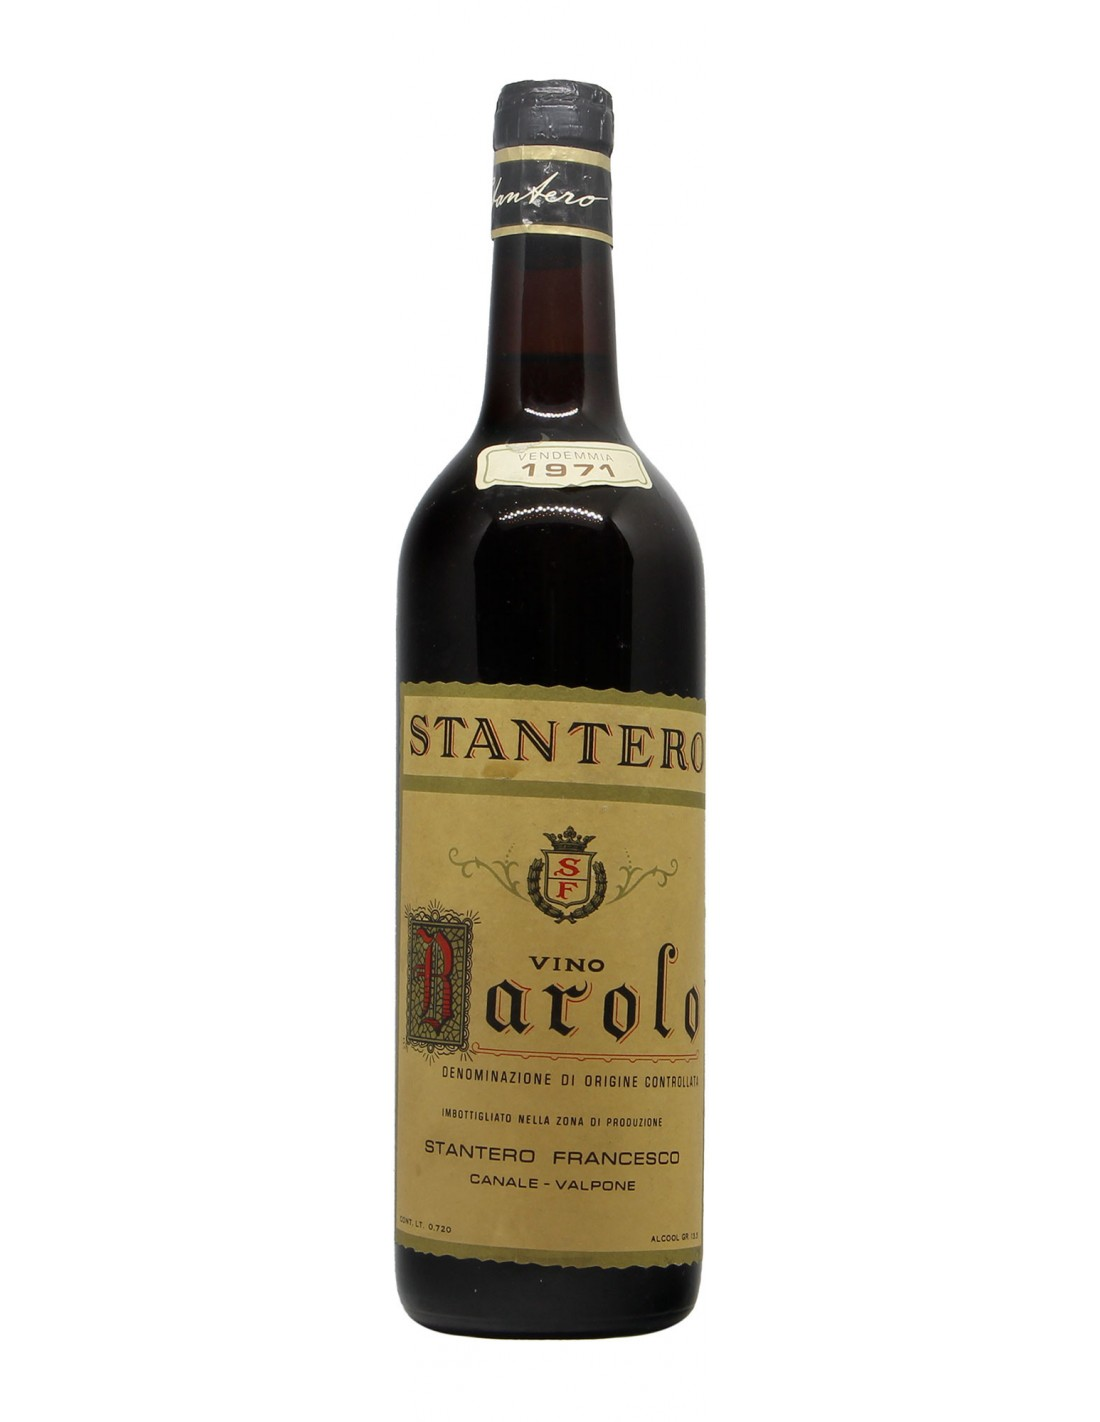 Barolo 1971 STANTERO GRANDI BOTTIGLIE